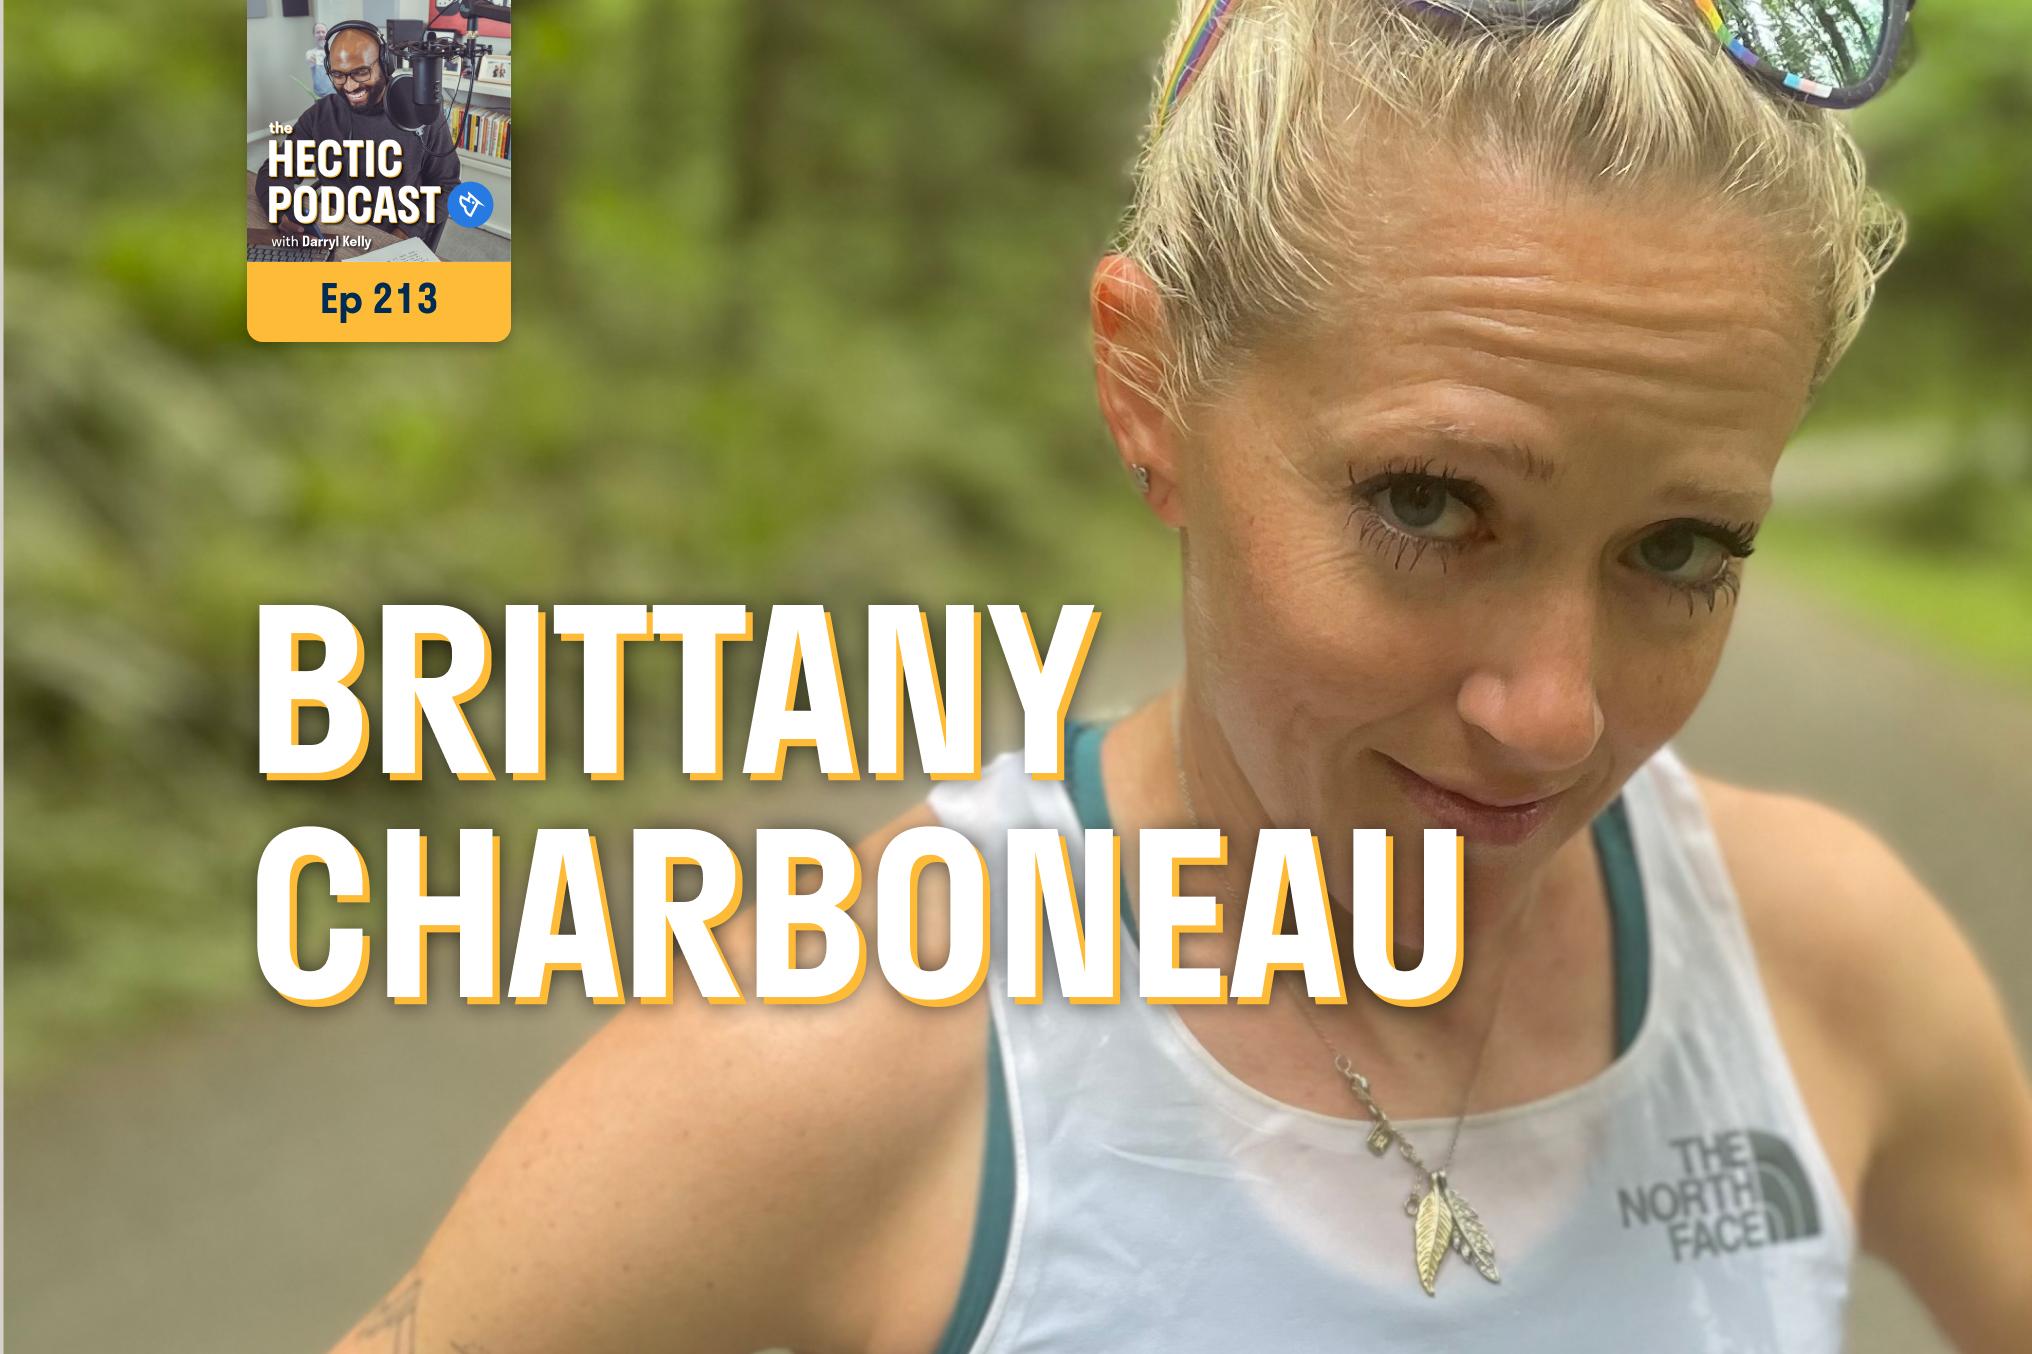 Brittany Charboneau